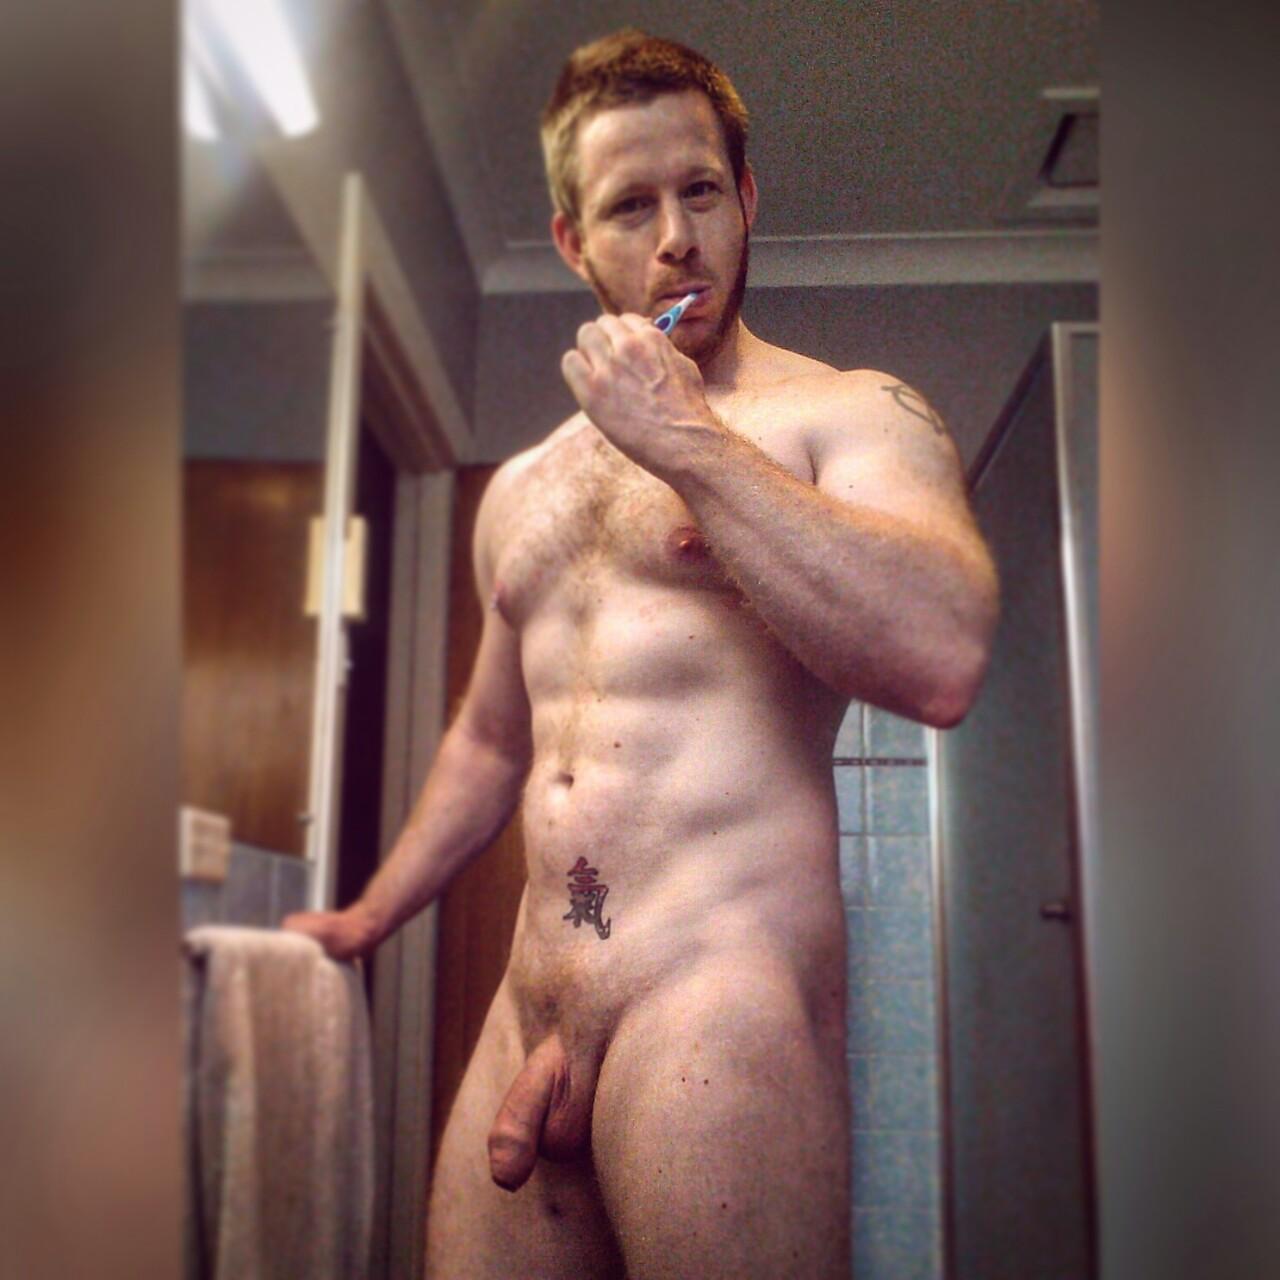 Nude jamaican straight men gay xxx guy 9